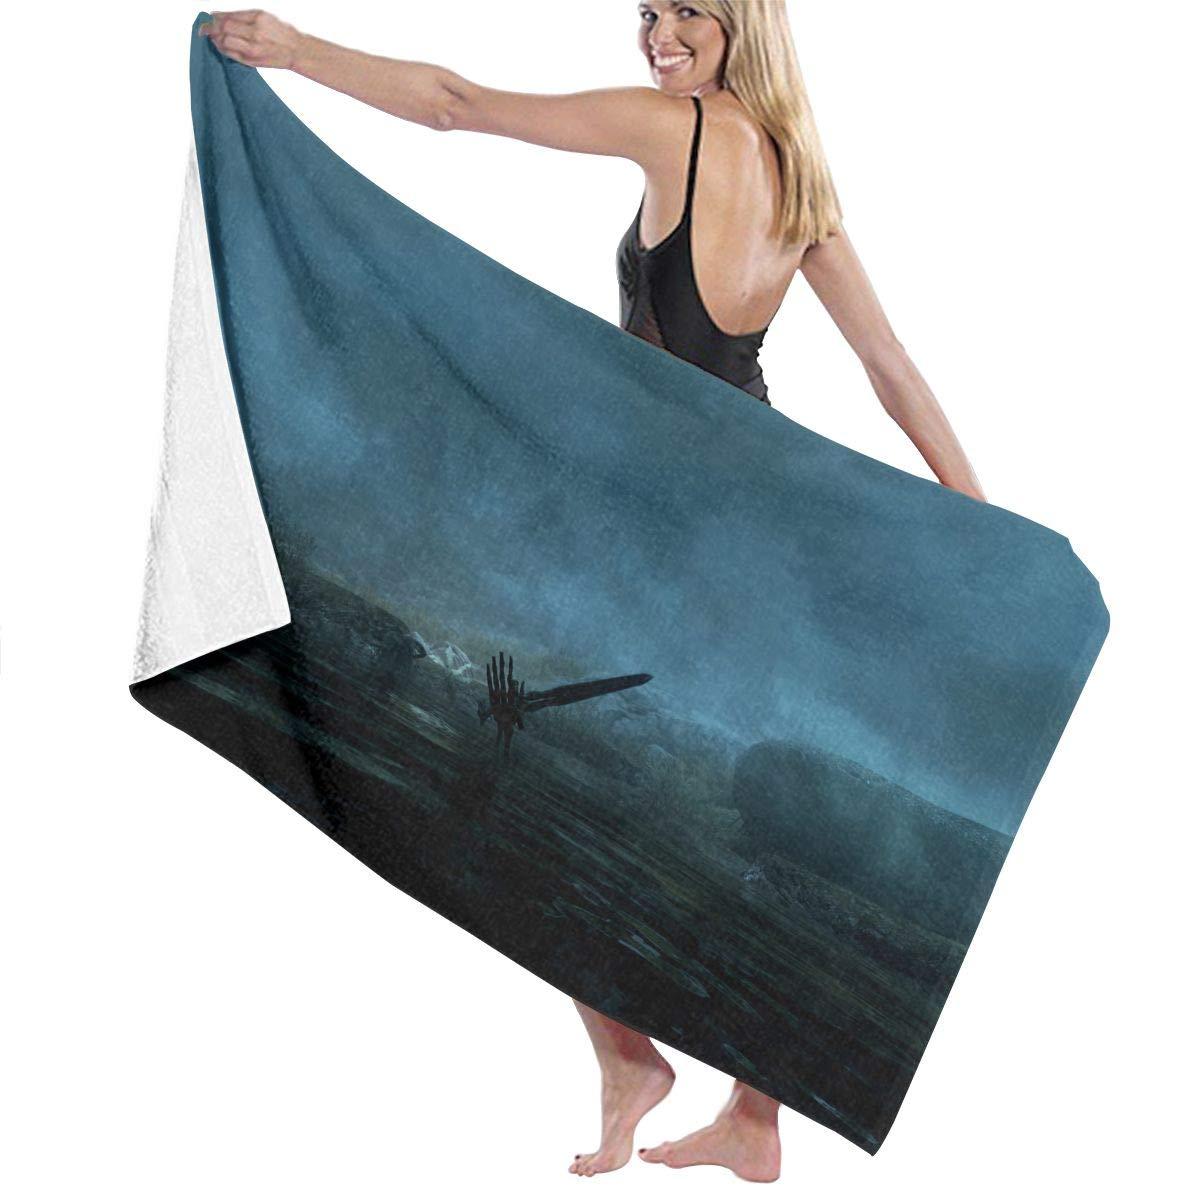 QWED Game Unisex Luxury Beach Towels Fashion Sauna Yoga Gym Towel